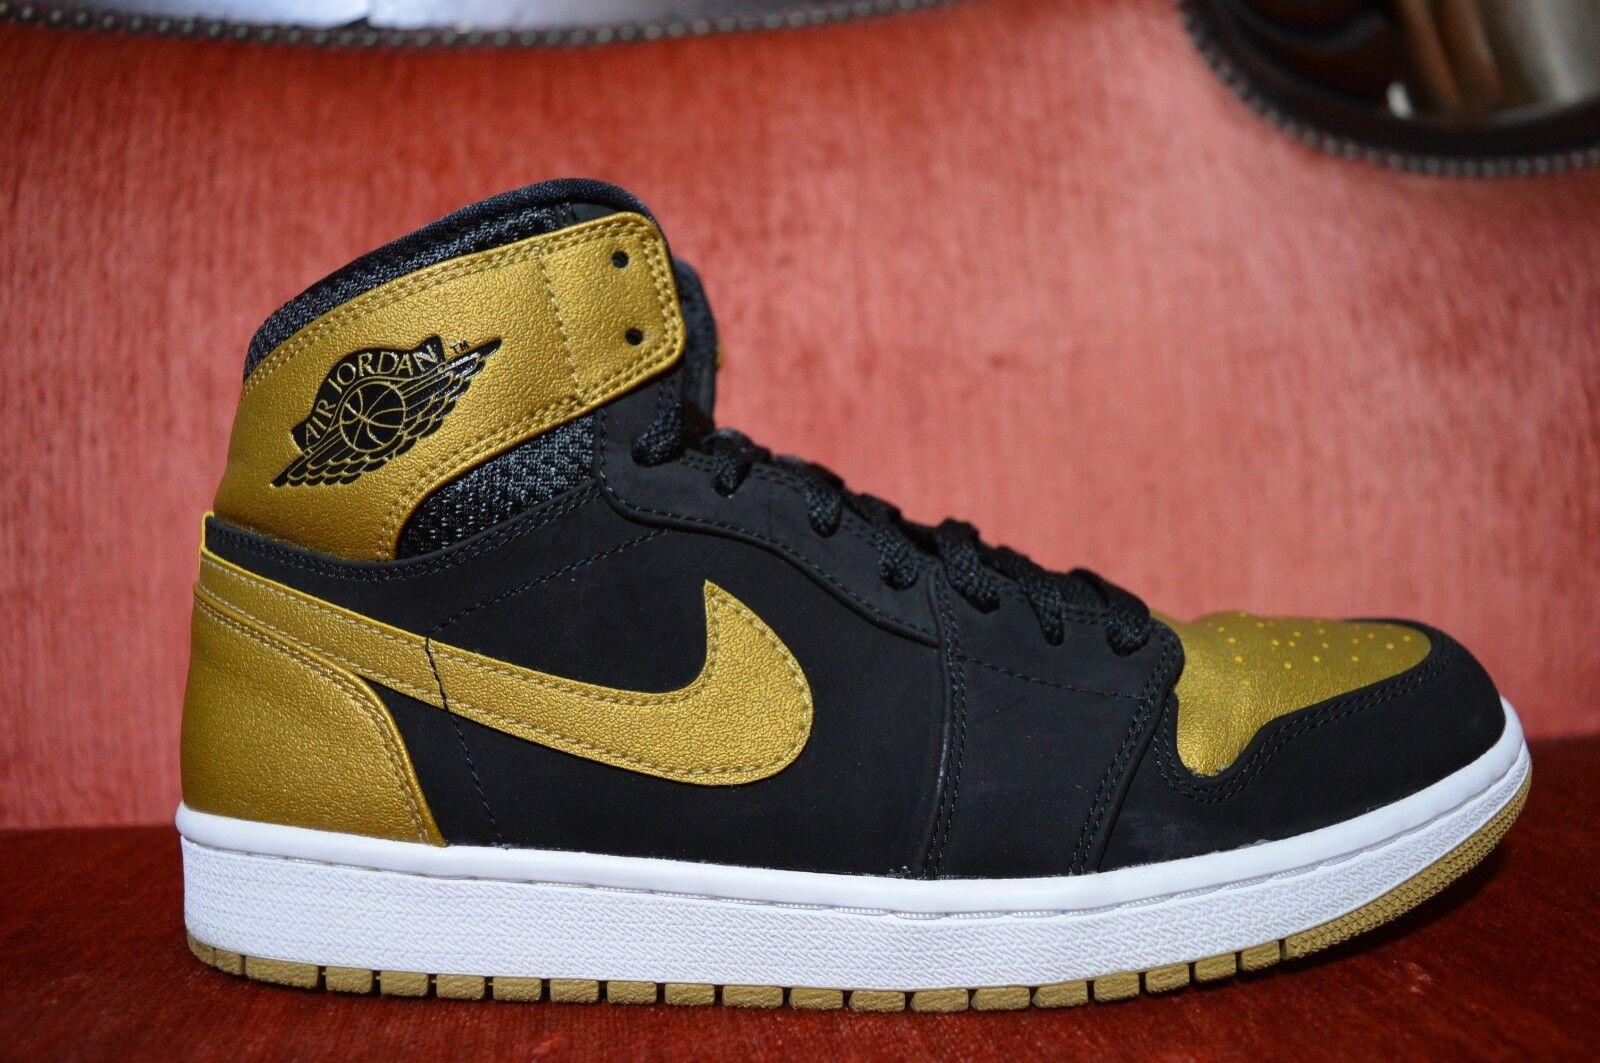 CLEAN Nike Air Jordan 1 Retro High Melo Black Gold-White Size 10 332550 026